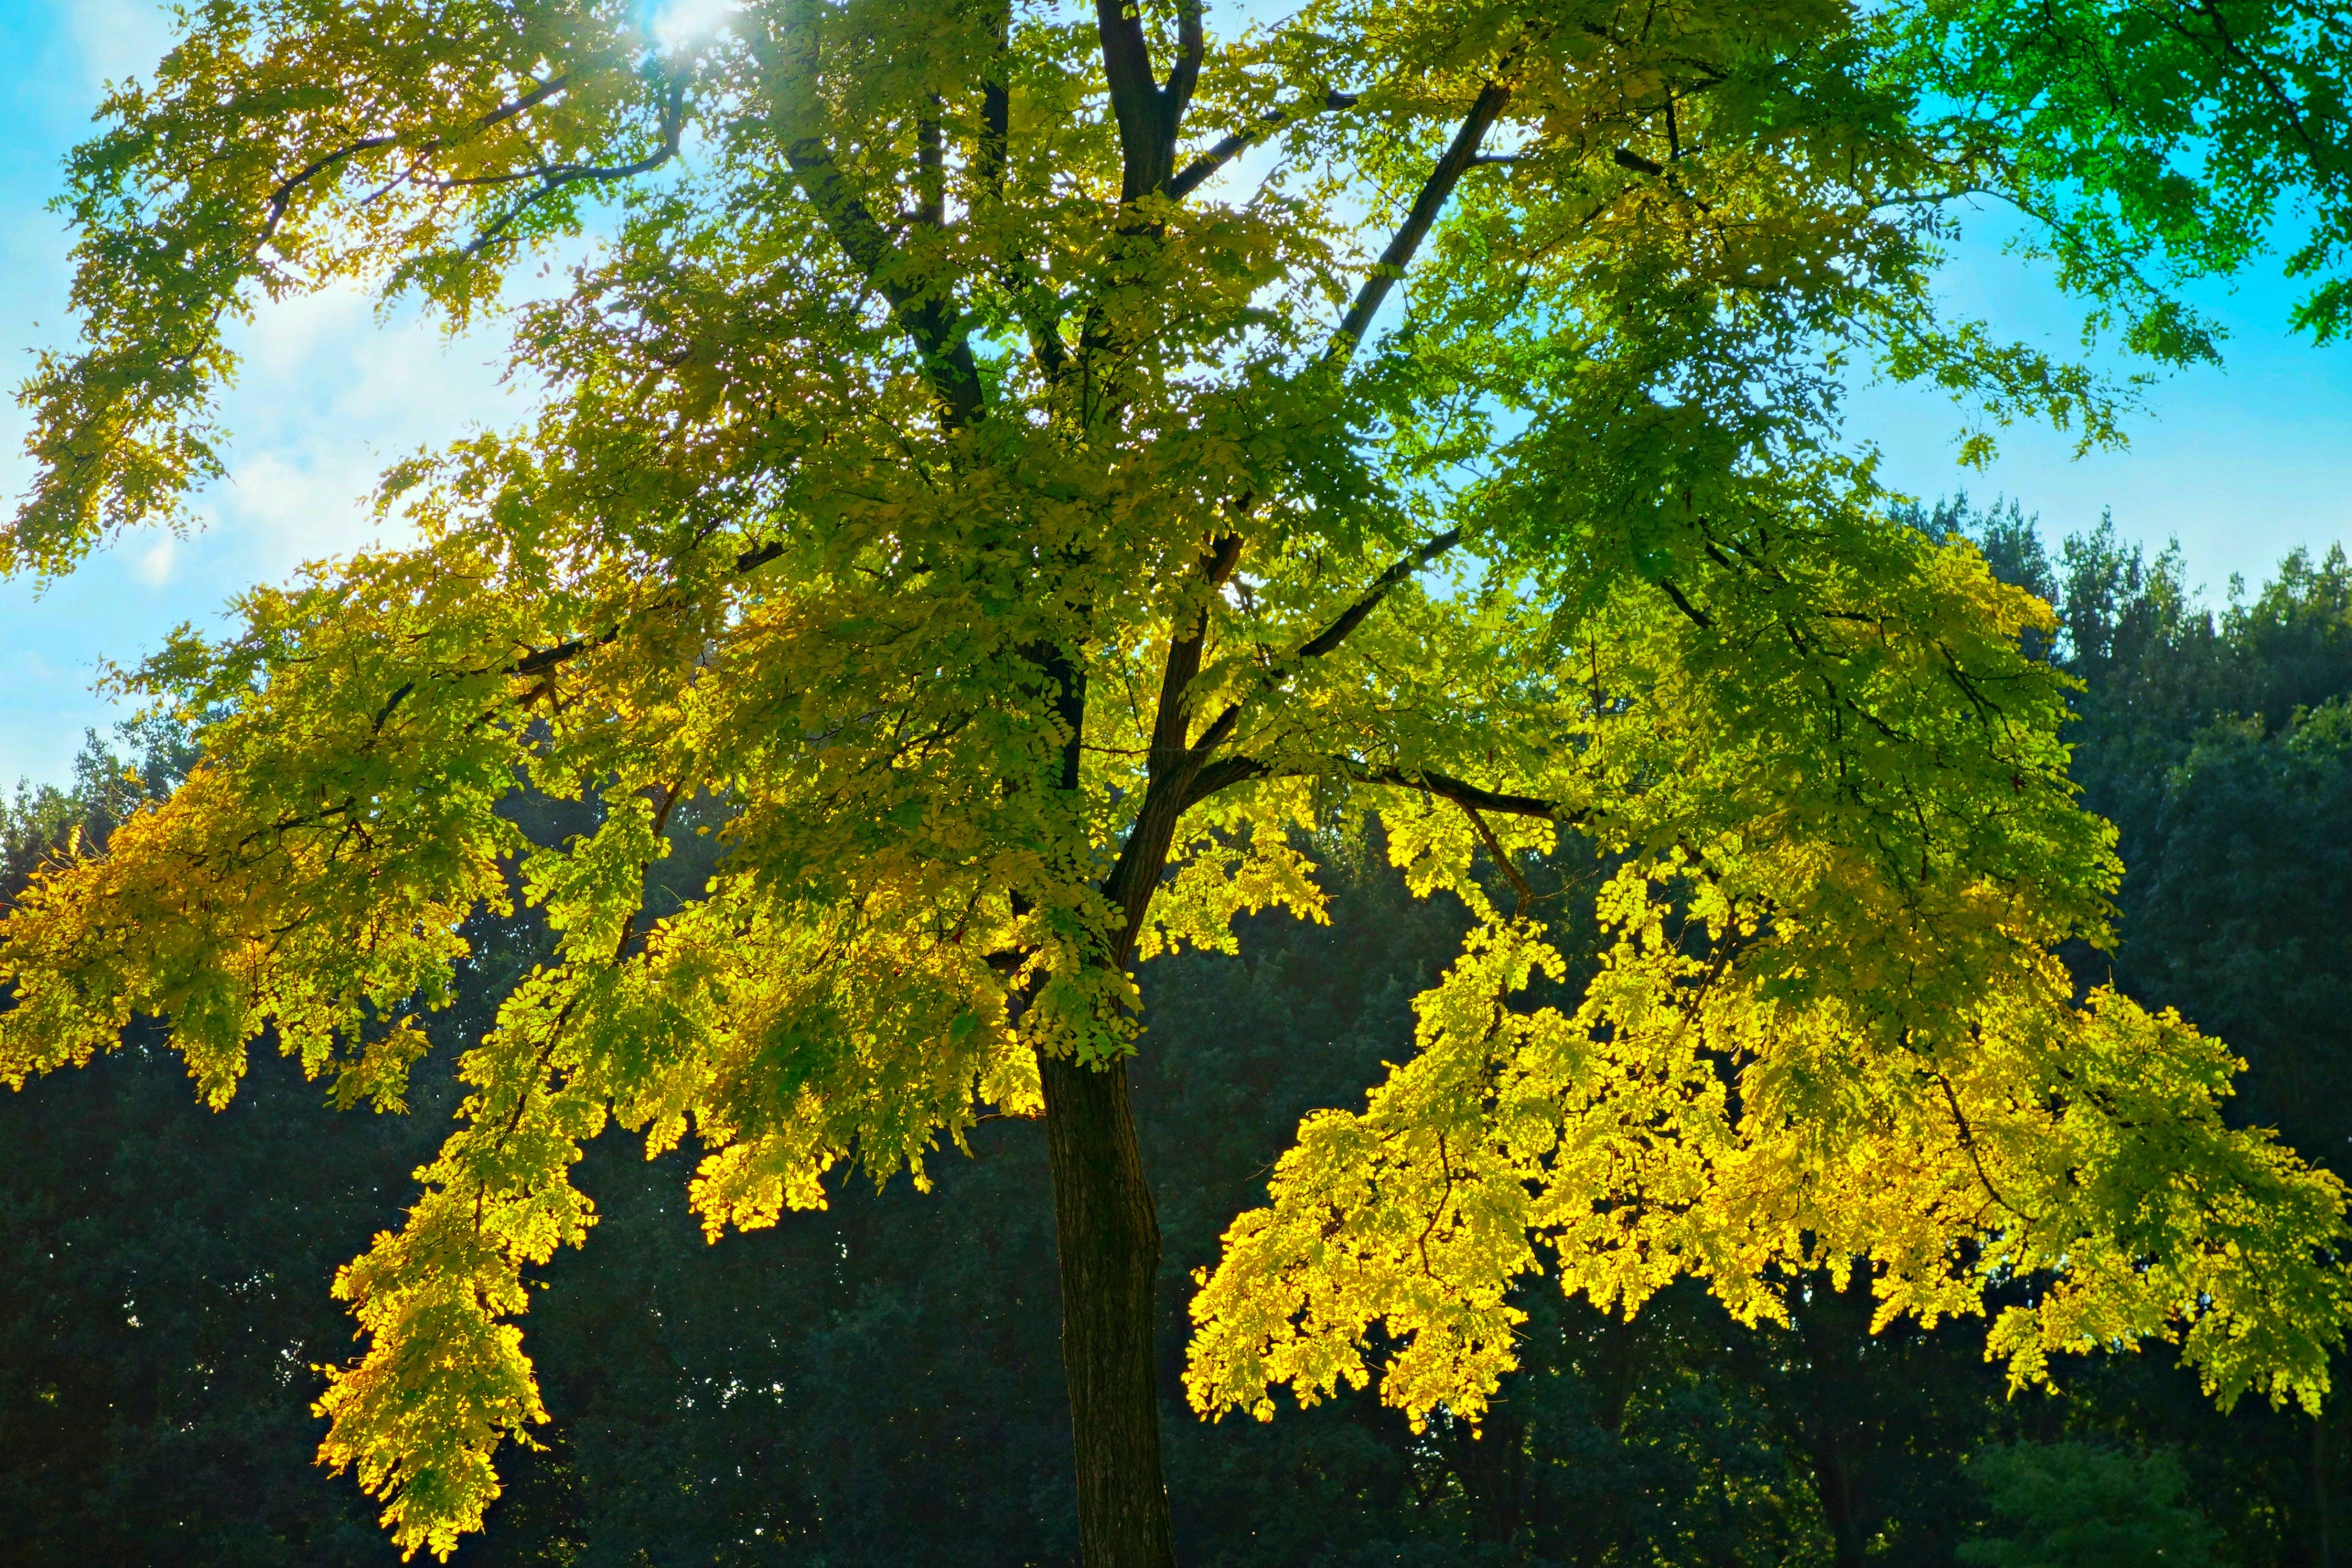 of autumn, back light, foliage, nature